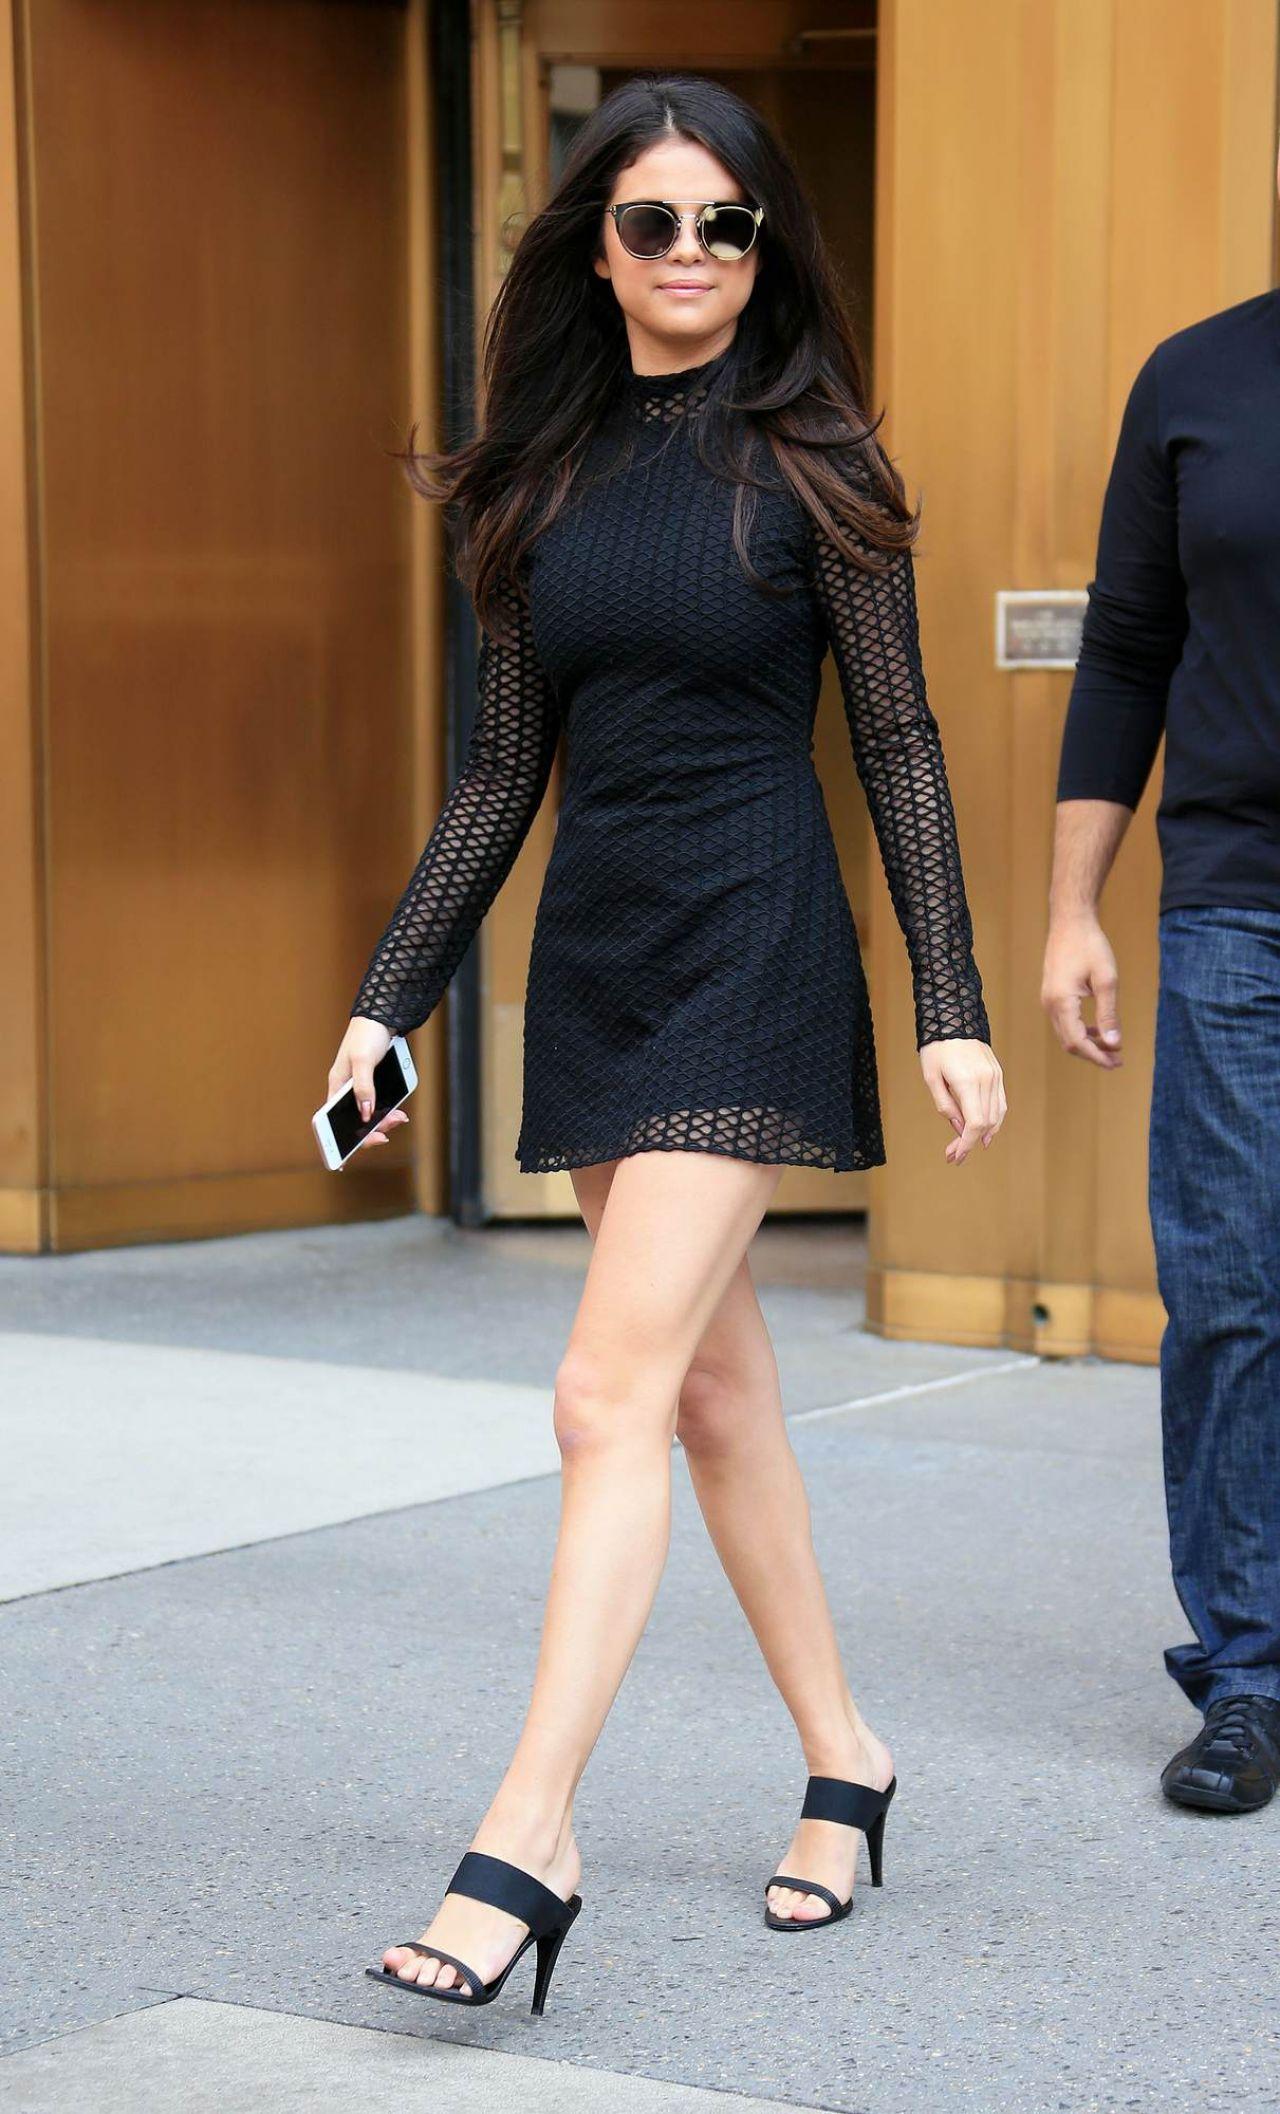 Selena Gomez Social Media Pics 05/01/2017